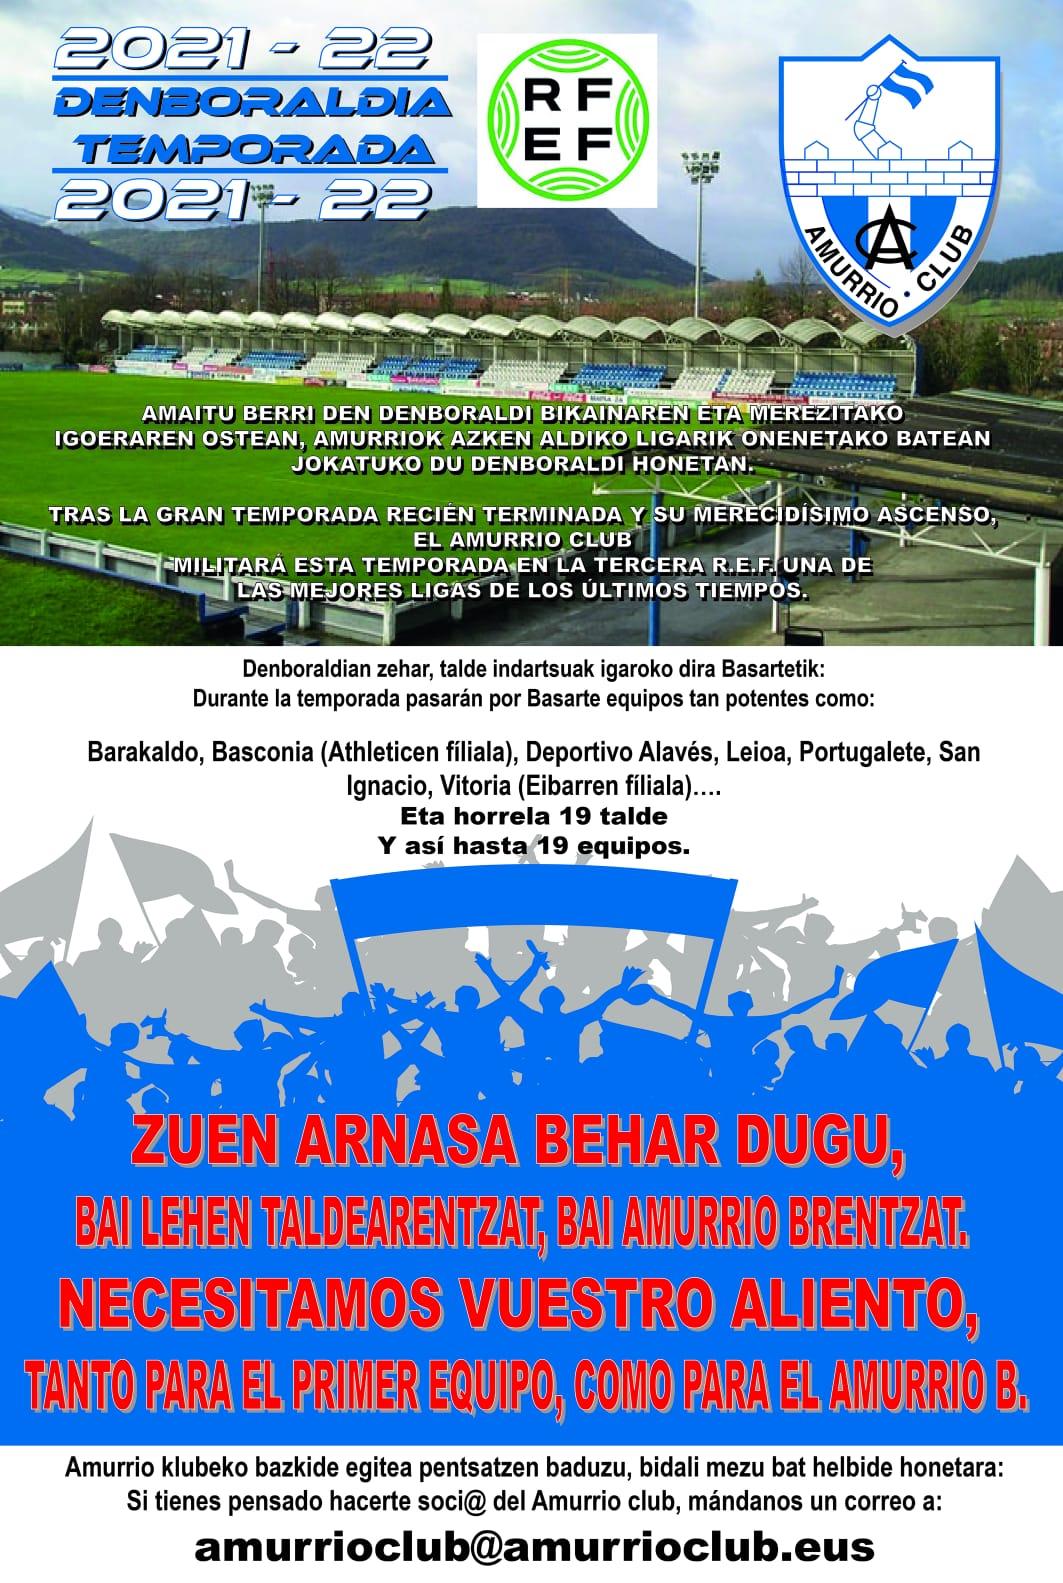 Amurrio Club - Socios - 2021 / 20222